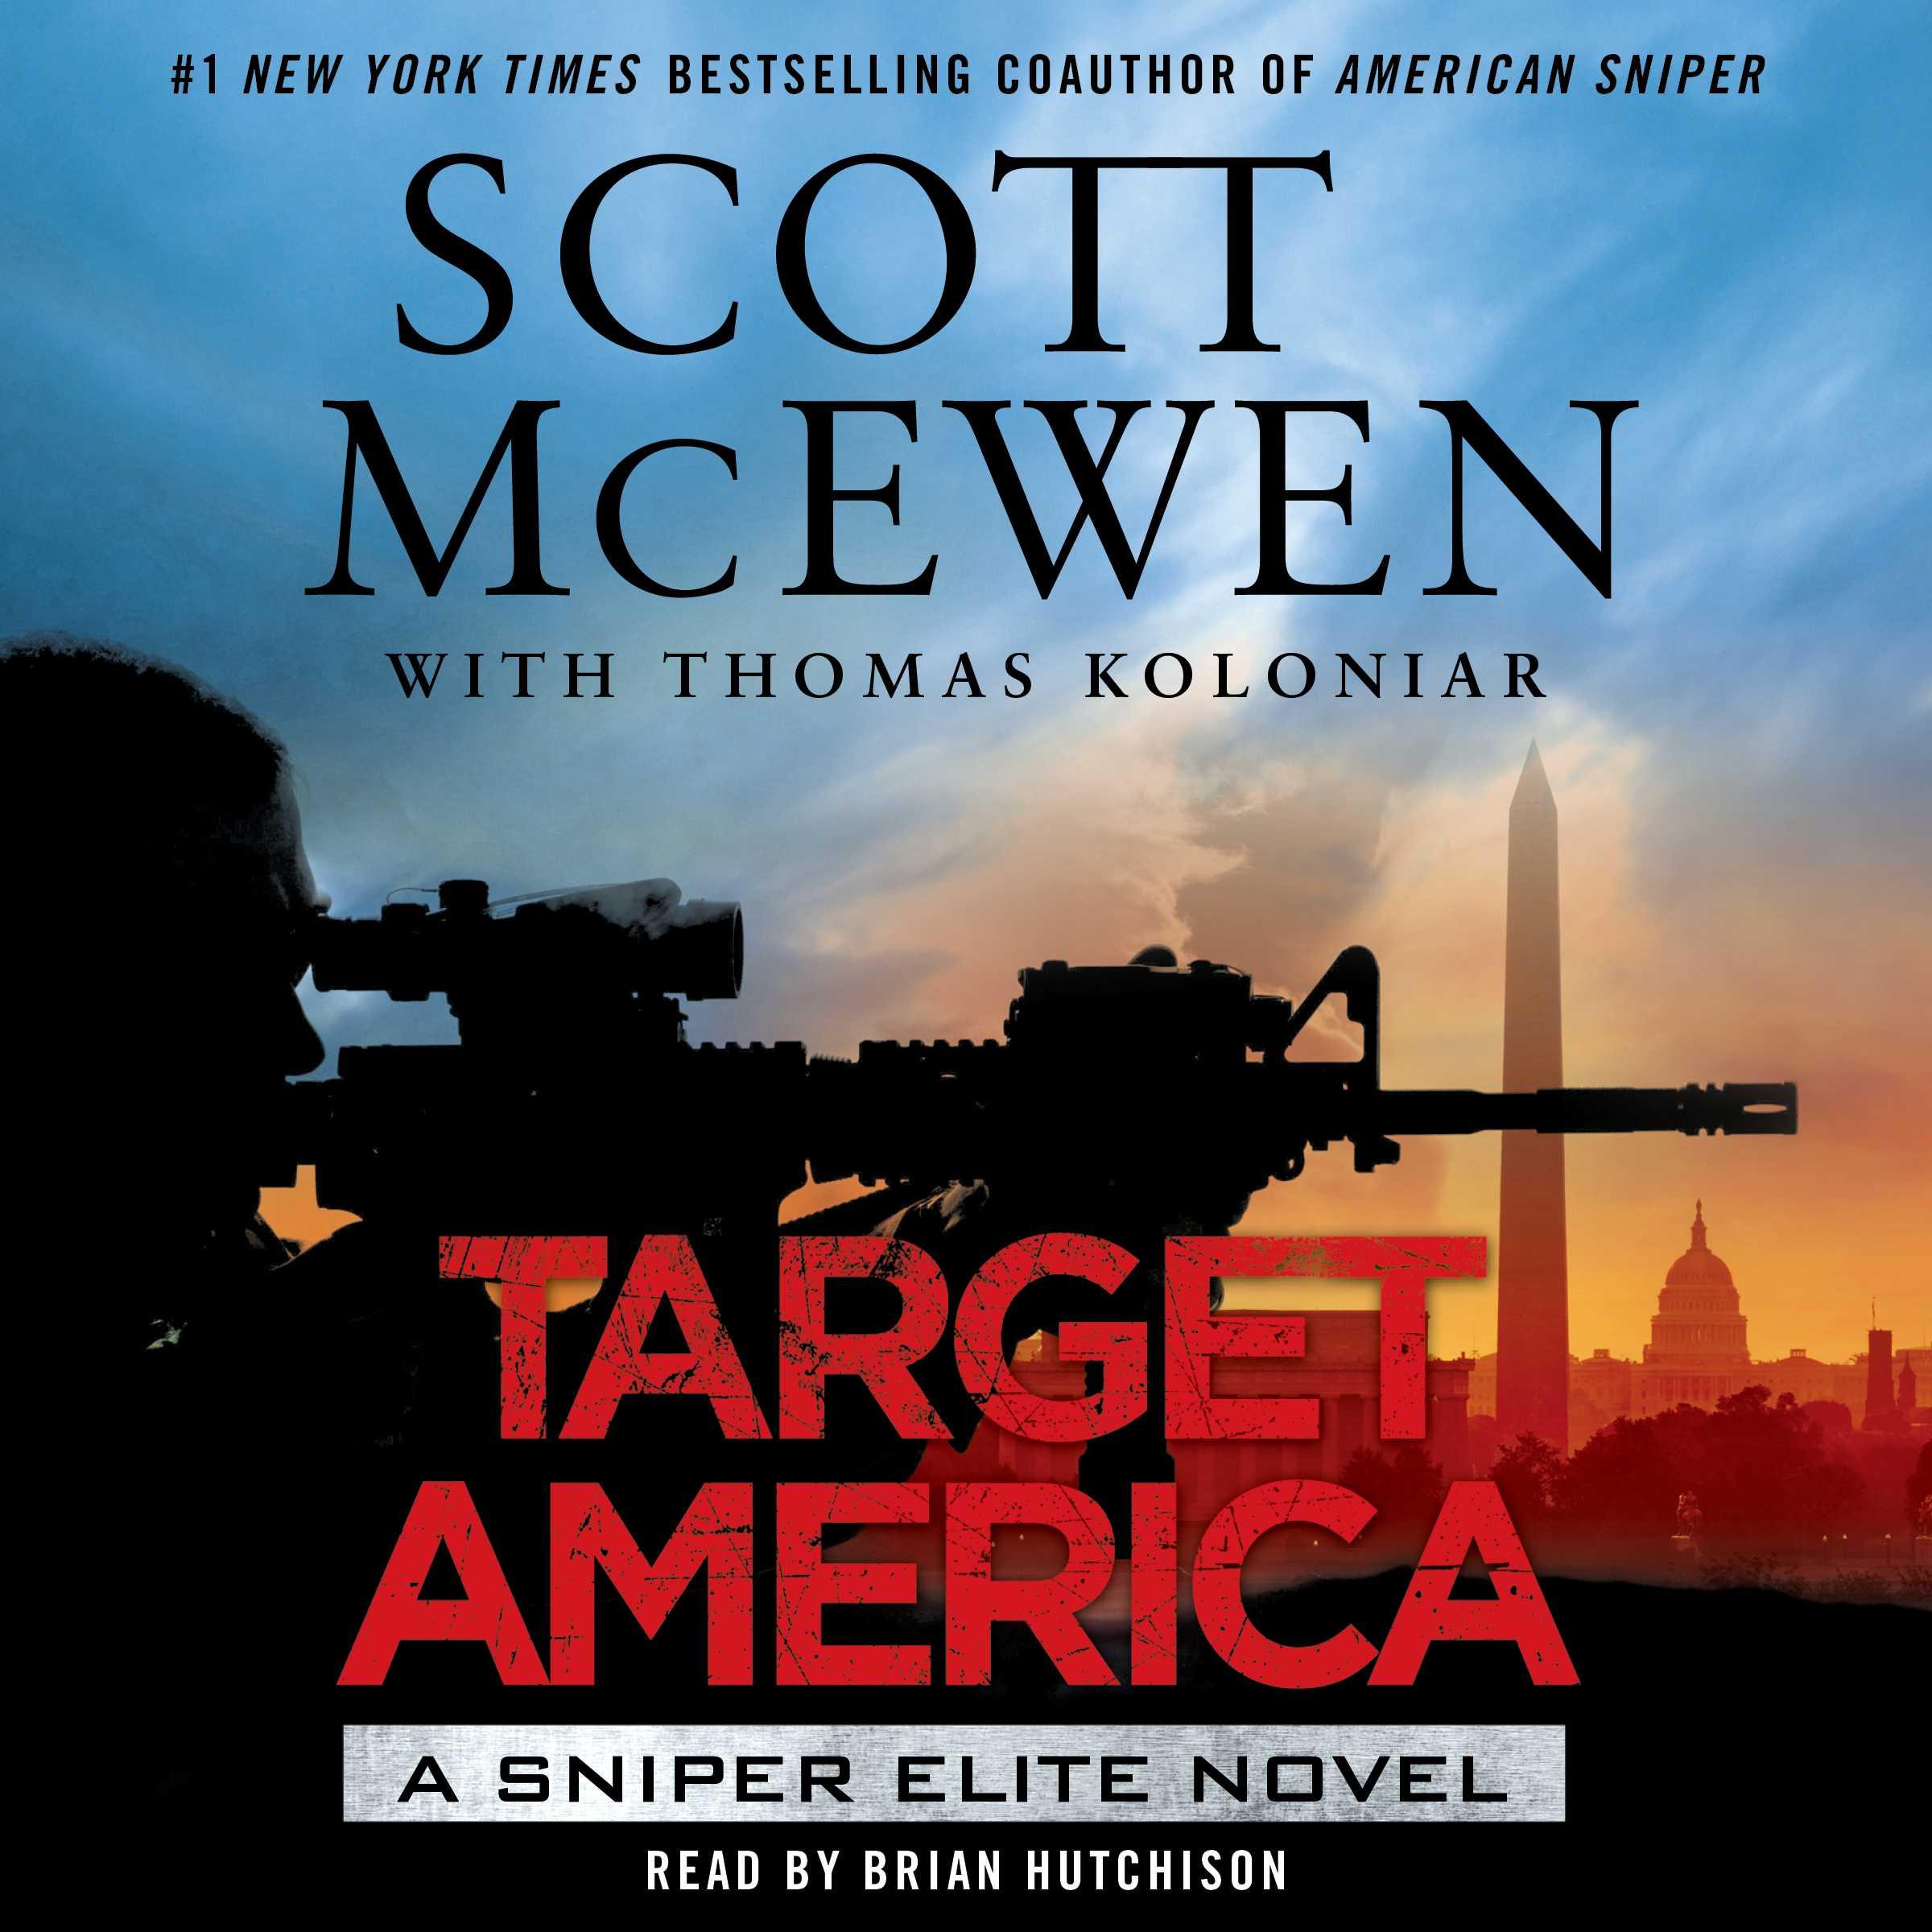 Target america a sniper elite novel ebook ebook 9781476747217 array target america audiobook by scott mcewen thomas koloniar brian rh simonandschuster com fandeluxe Images